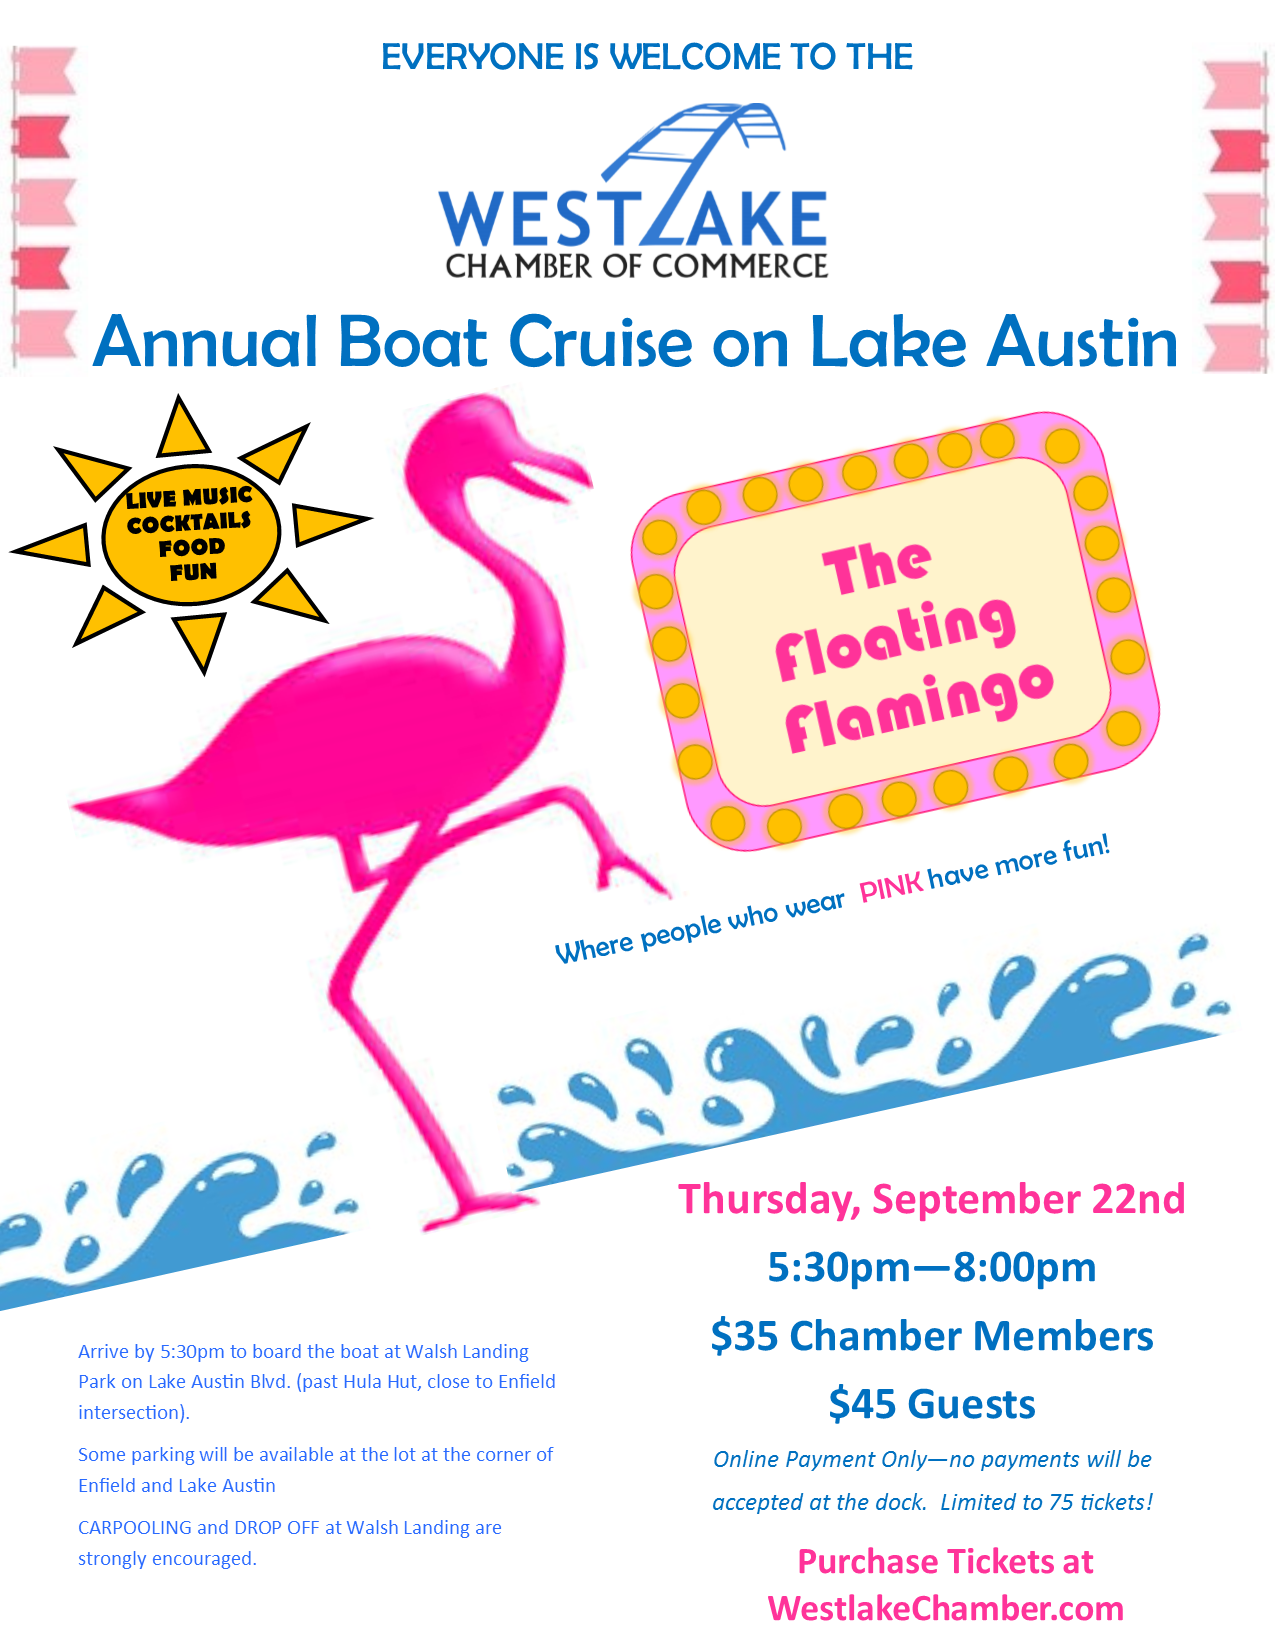 Annual Boat Cruise on Lake Austin